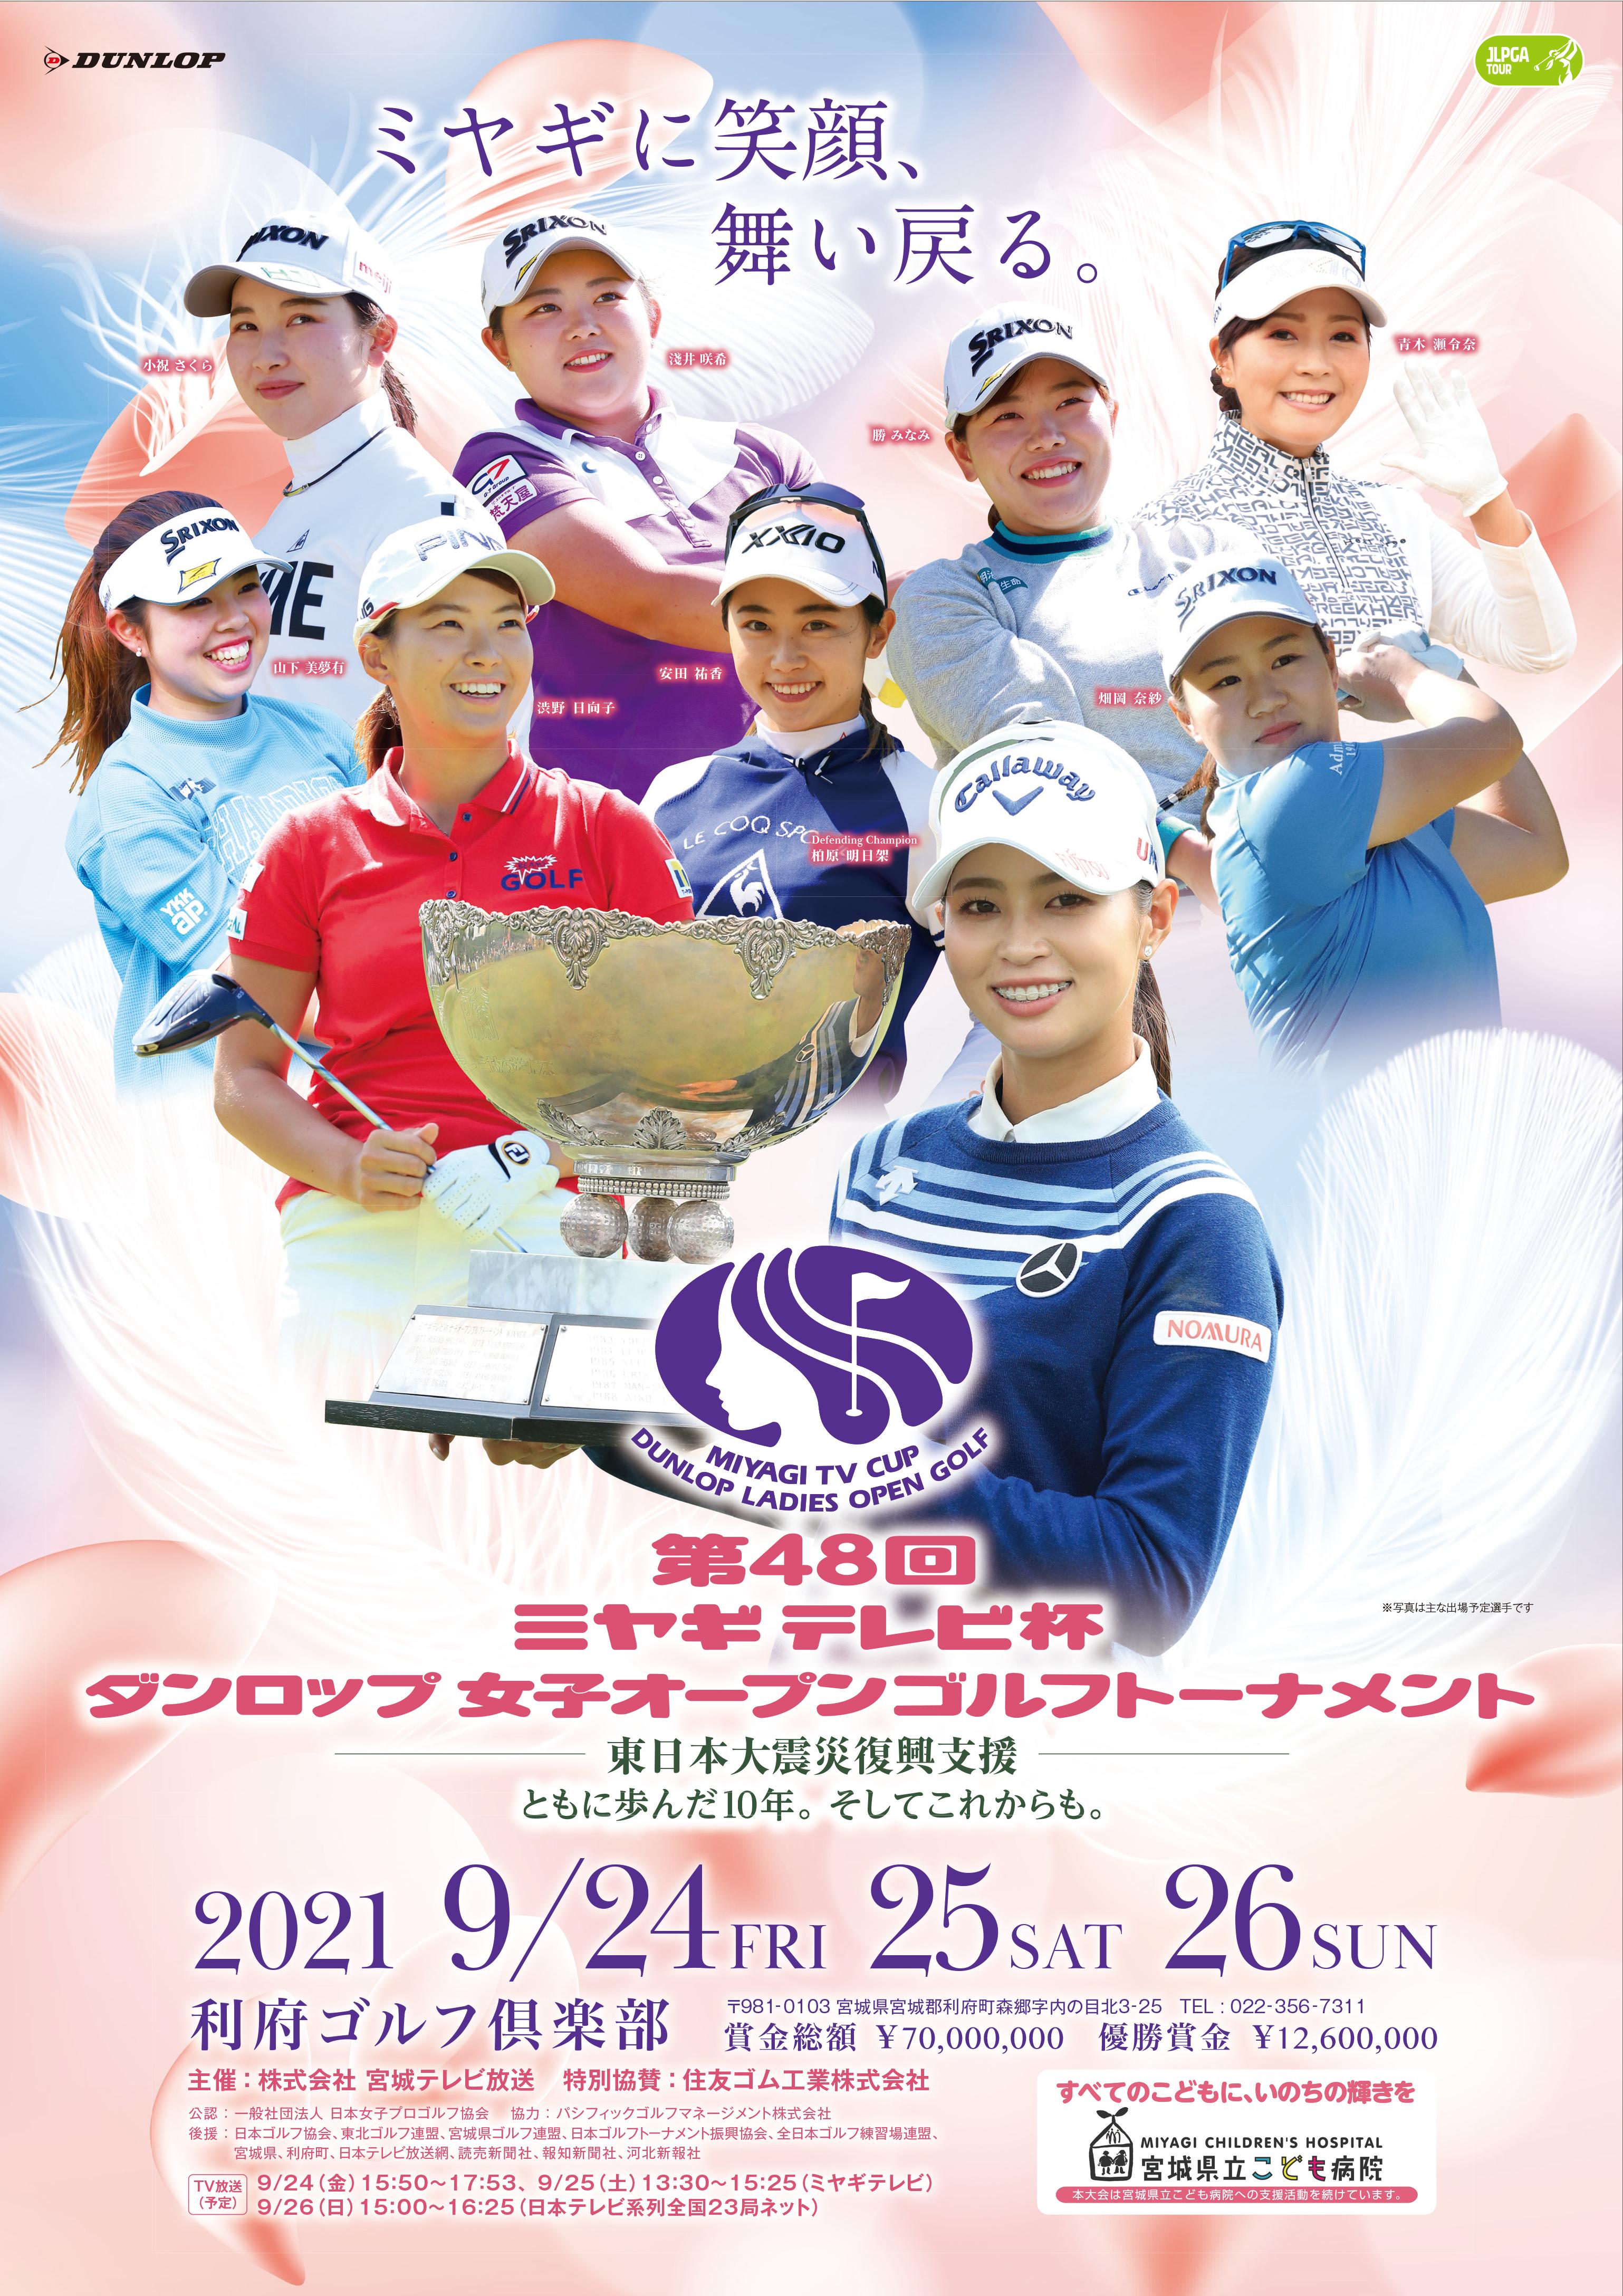 48th Miyagi TV Cup Dunlop Ladies Open Golf Tournament